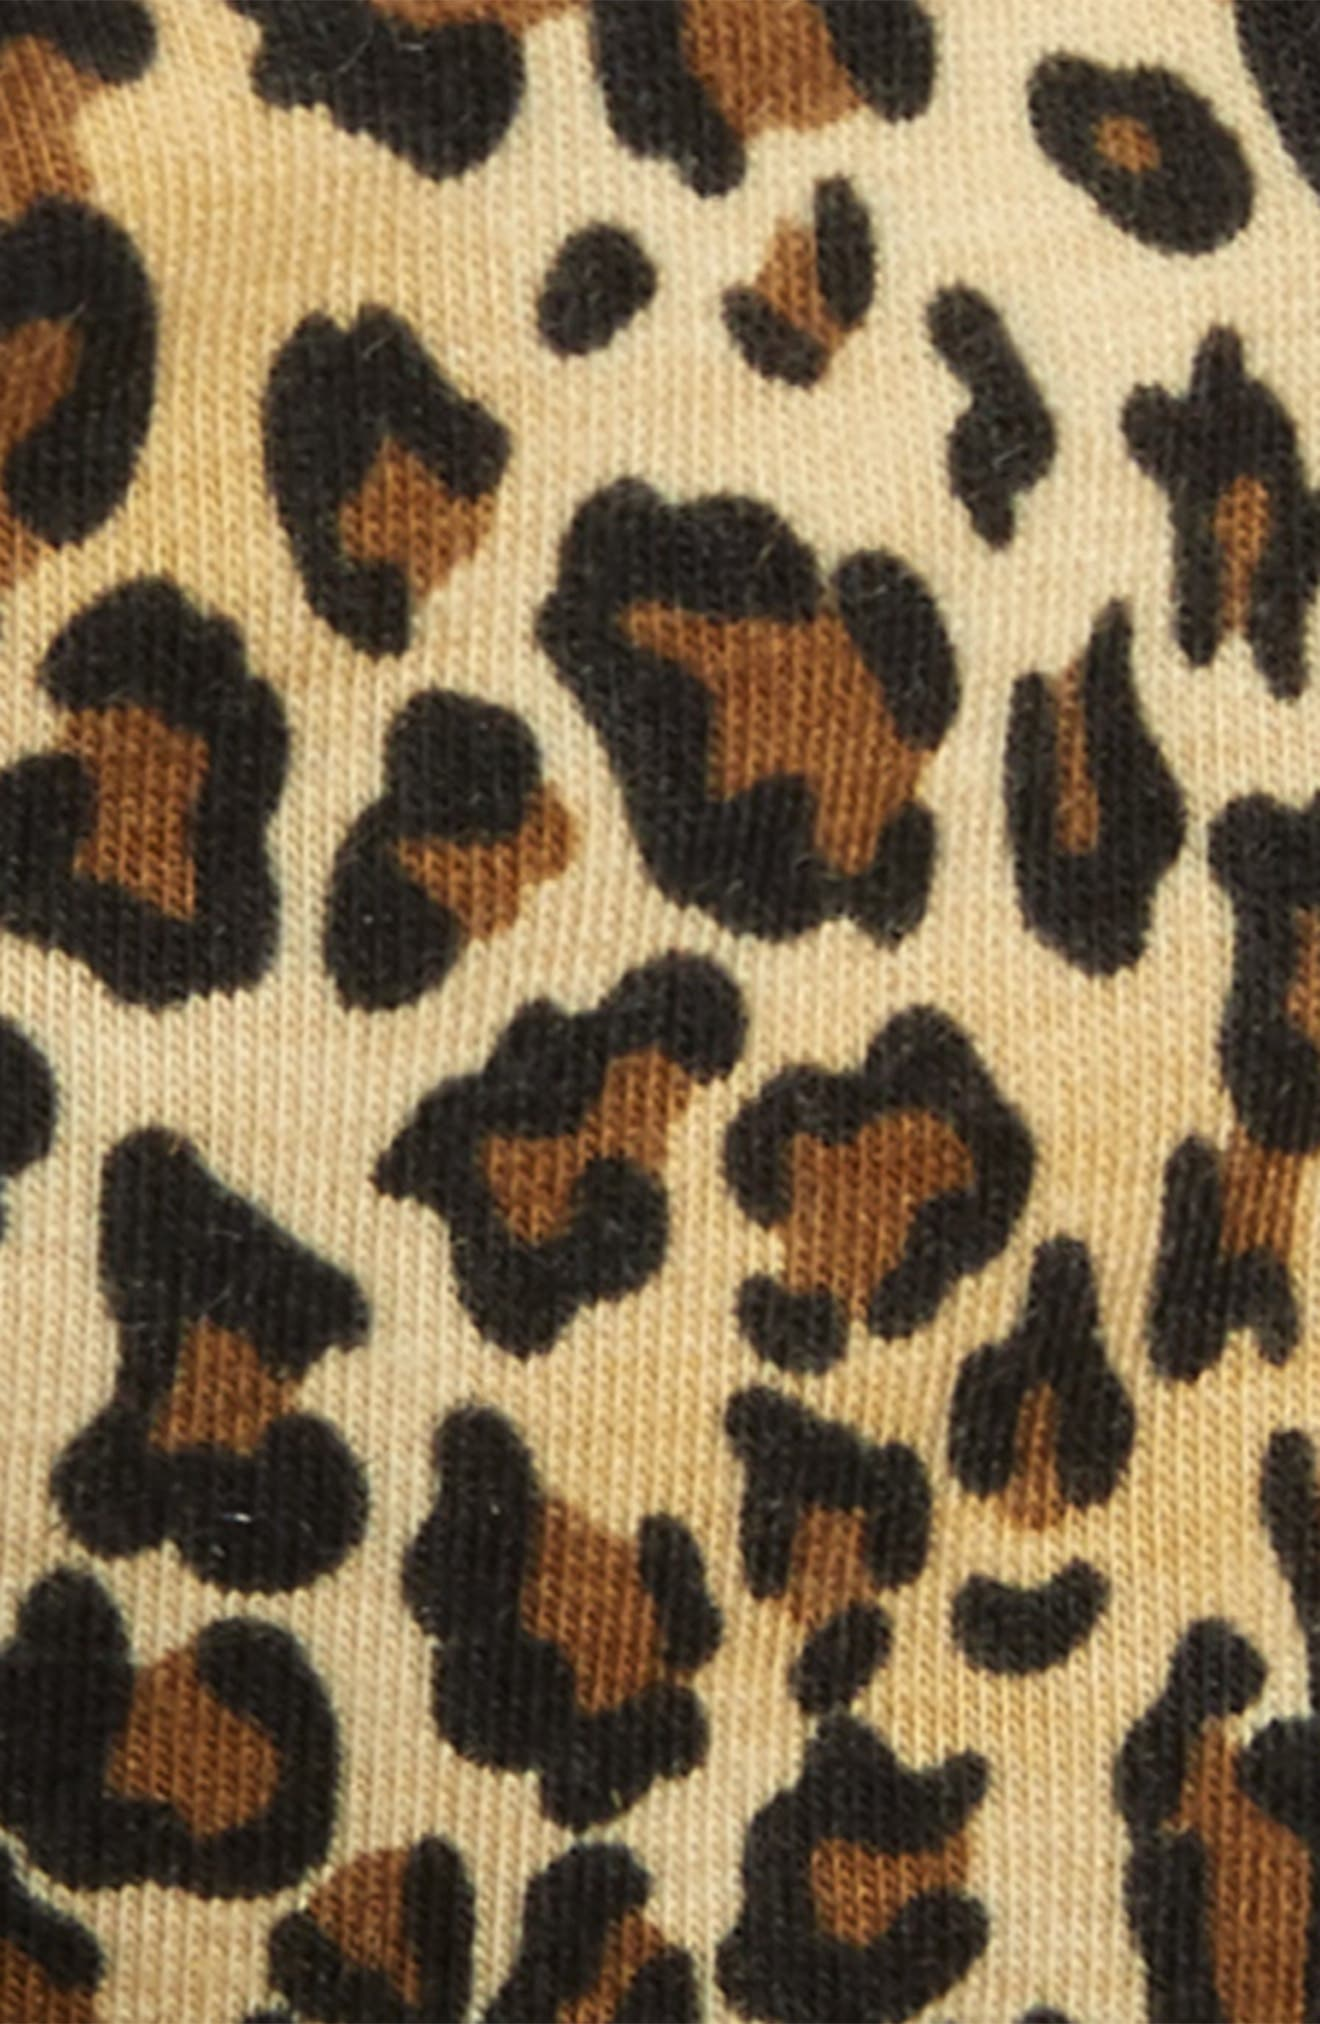 Animal Print Faux Fur Beanie,                             Alternate thumbnail 2, color,                             200